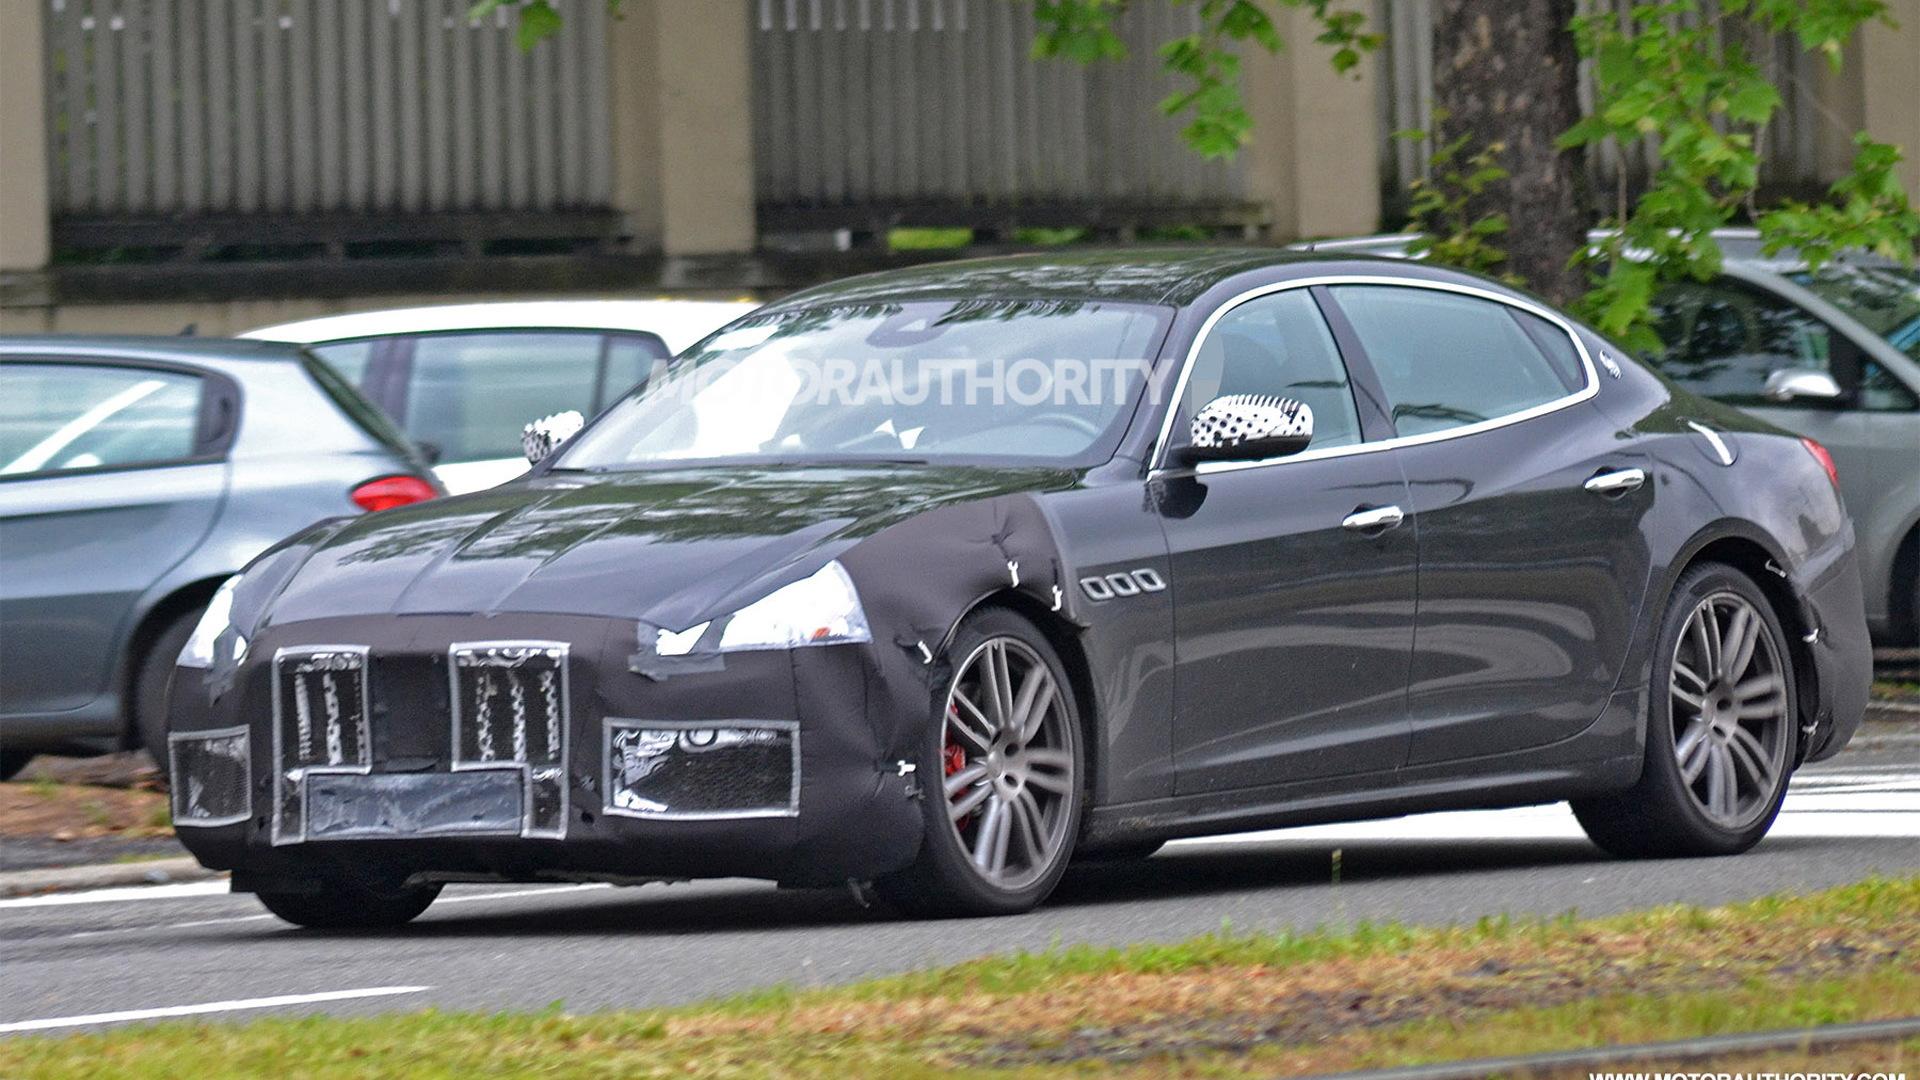 2018 Maserati Quattroporte spy shots - Image via S. Baldauf/SB-Medien